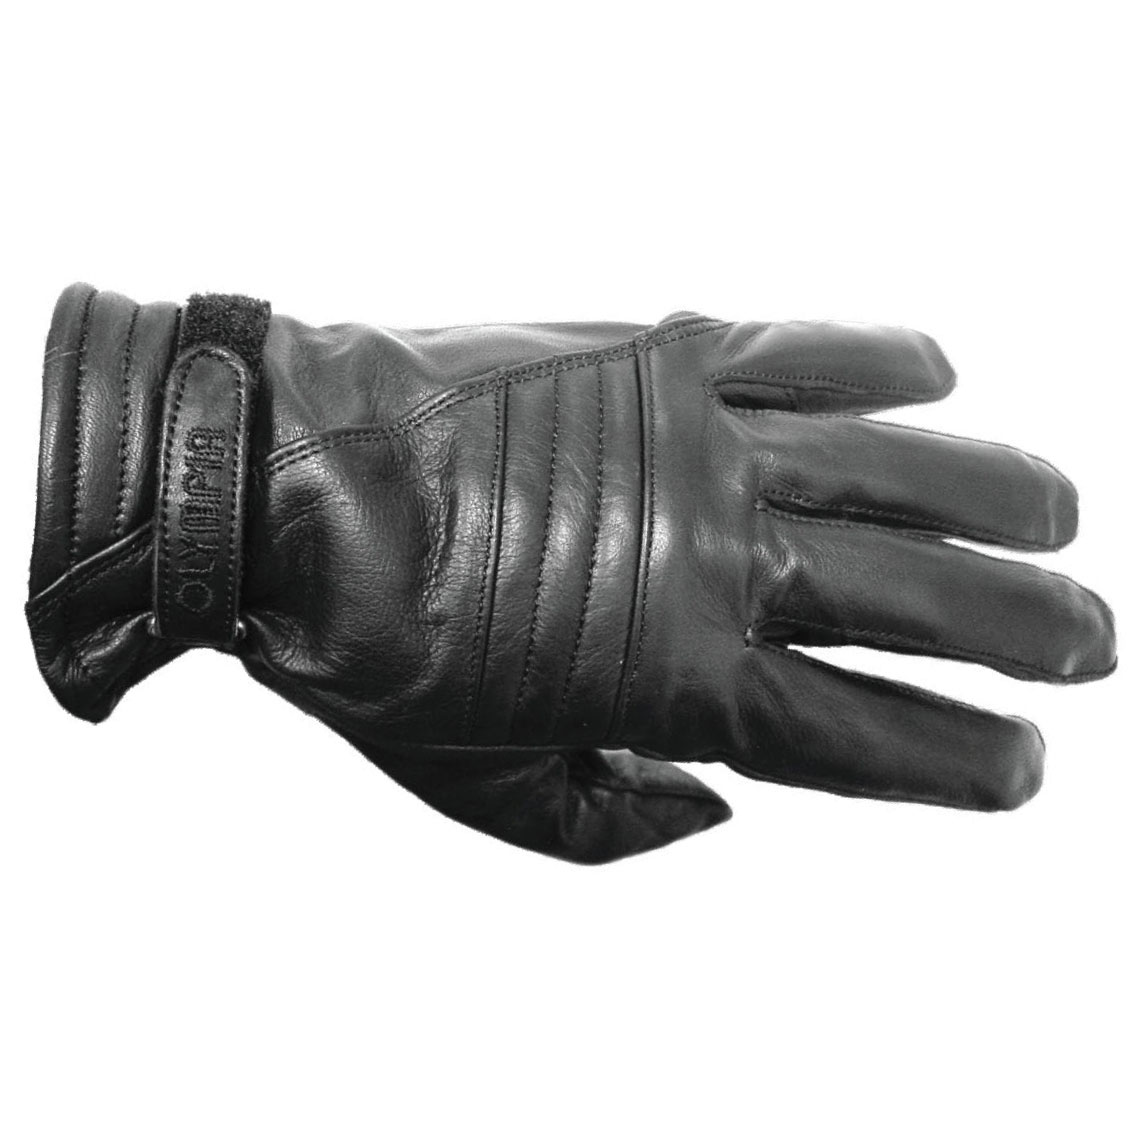 Olympia Gel Padded Gloves